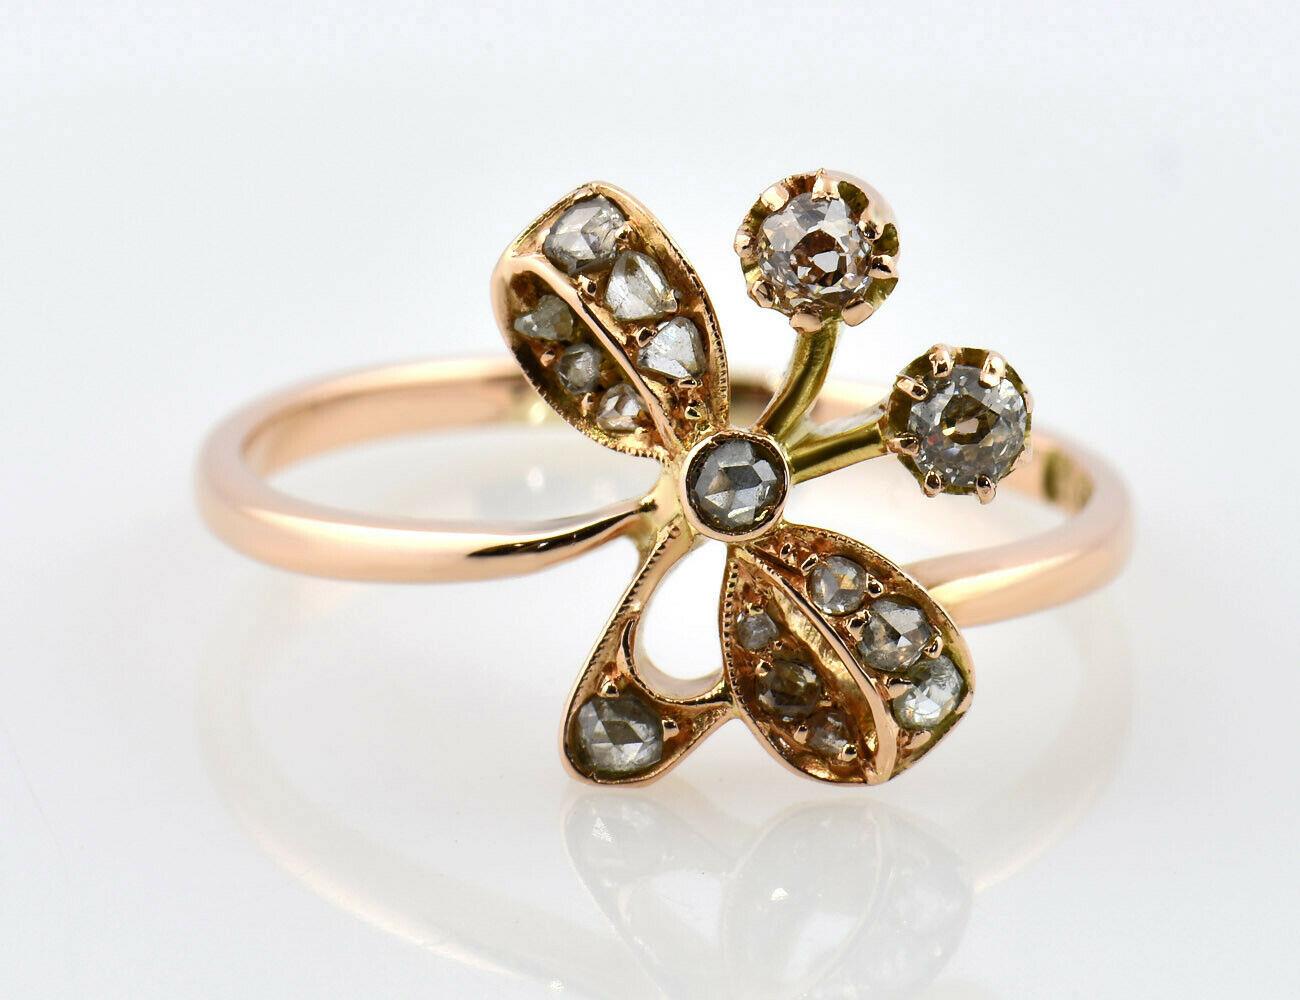 Ring Diamant 585/000 14 K Rotgold, 16 Diamanten zus. 0,27 ct